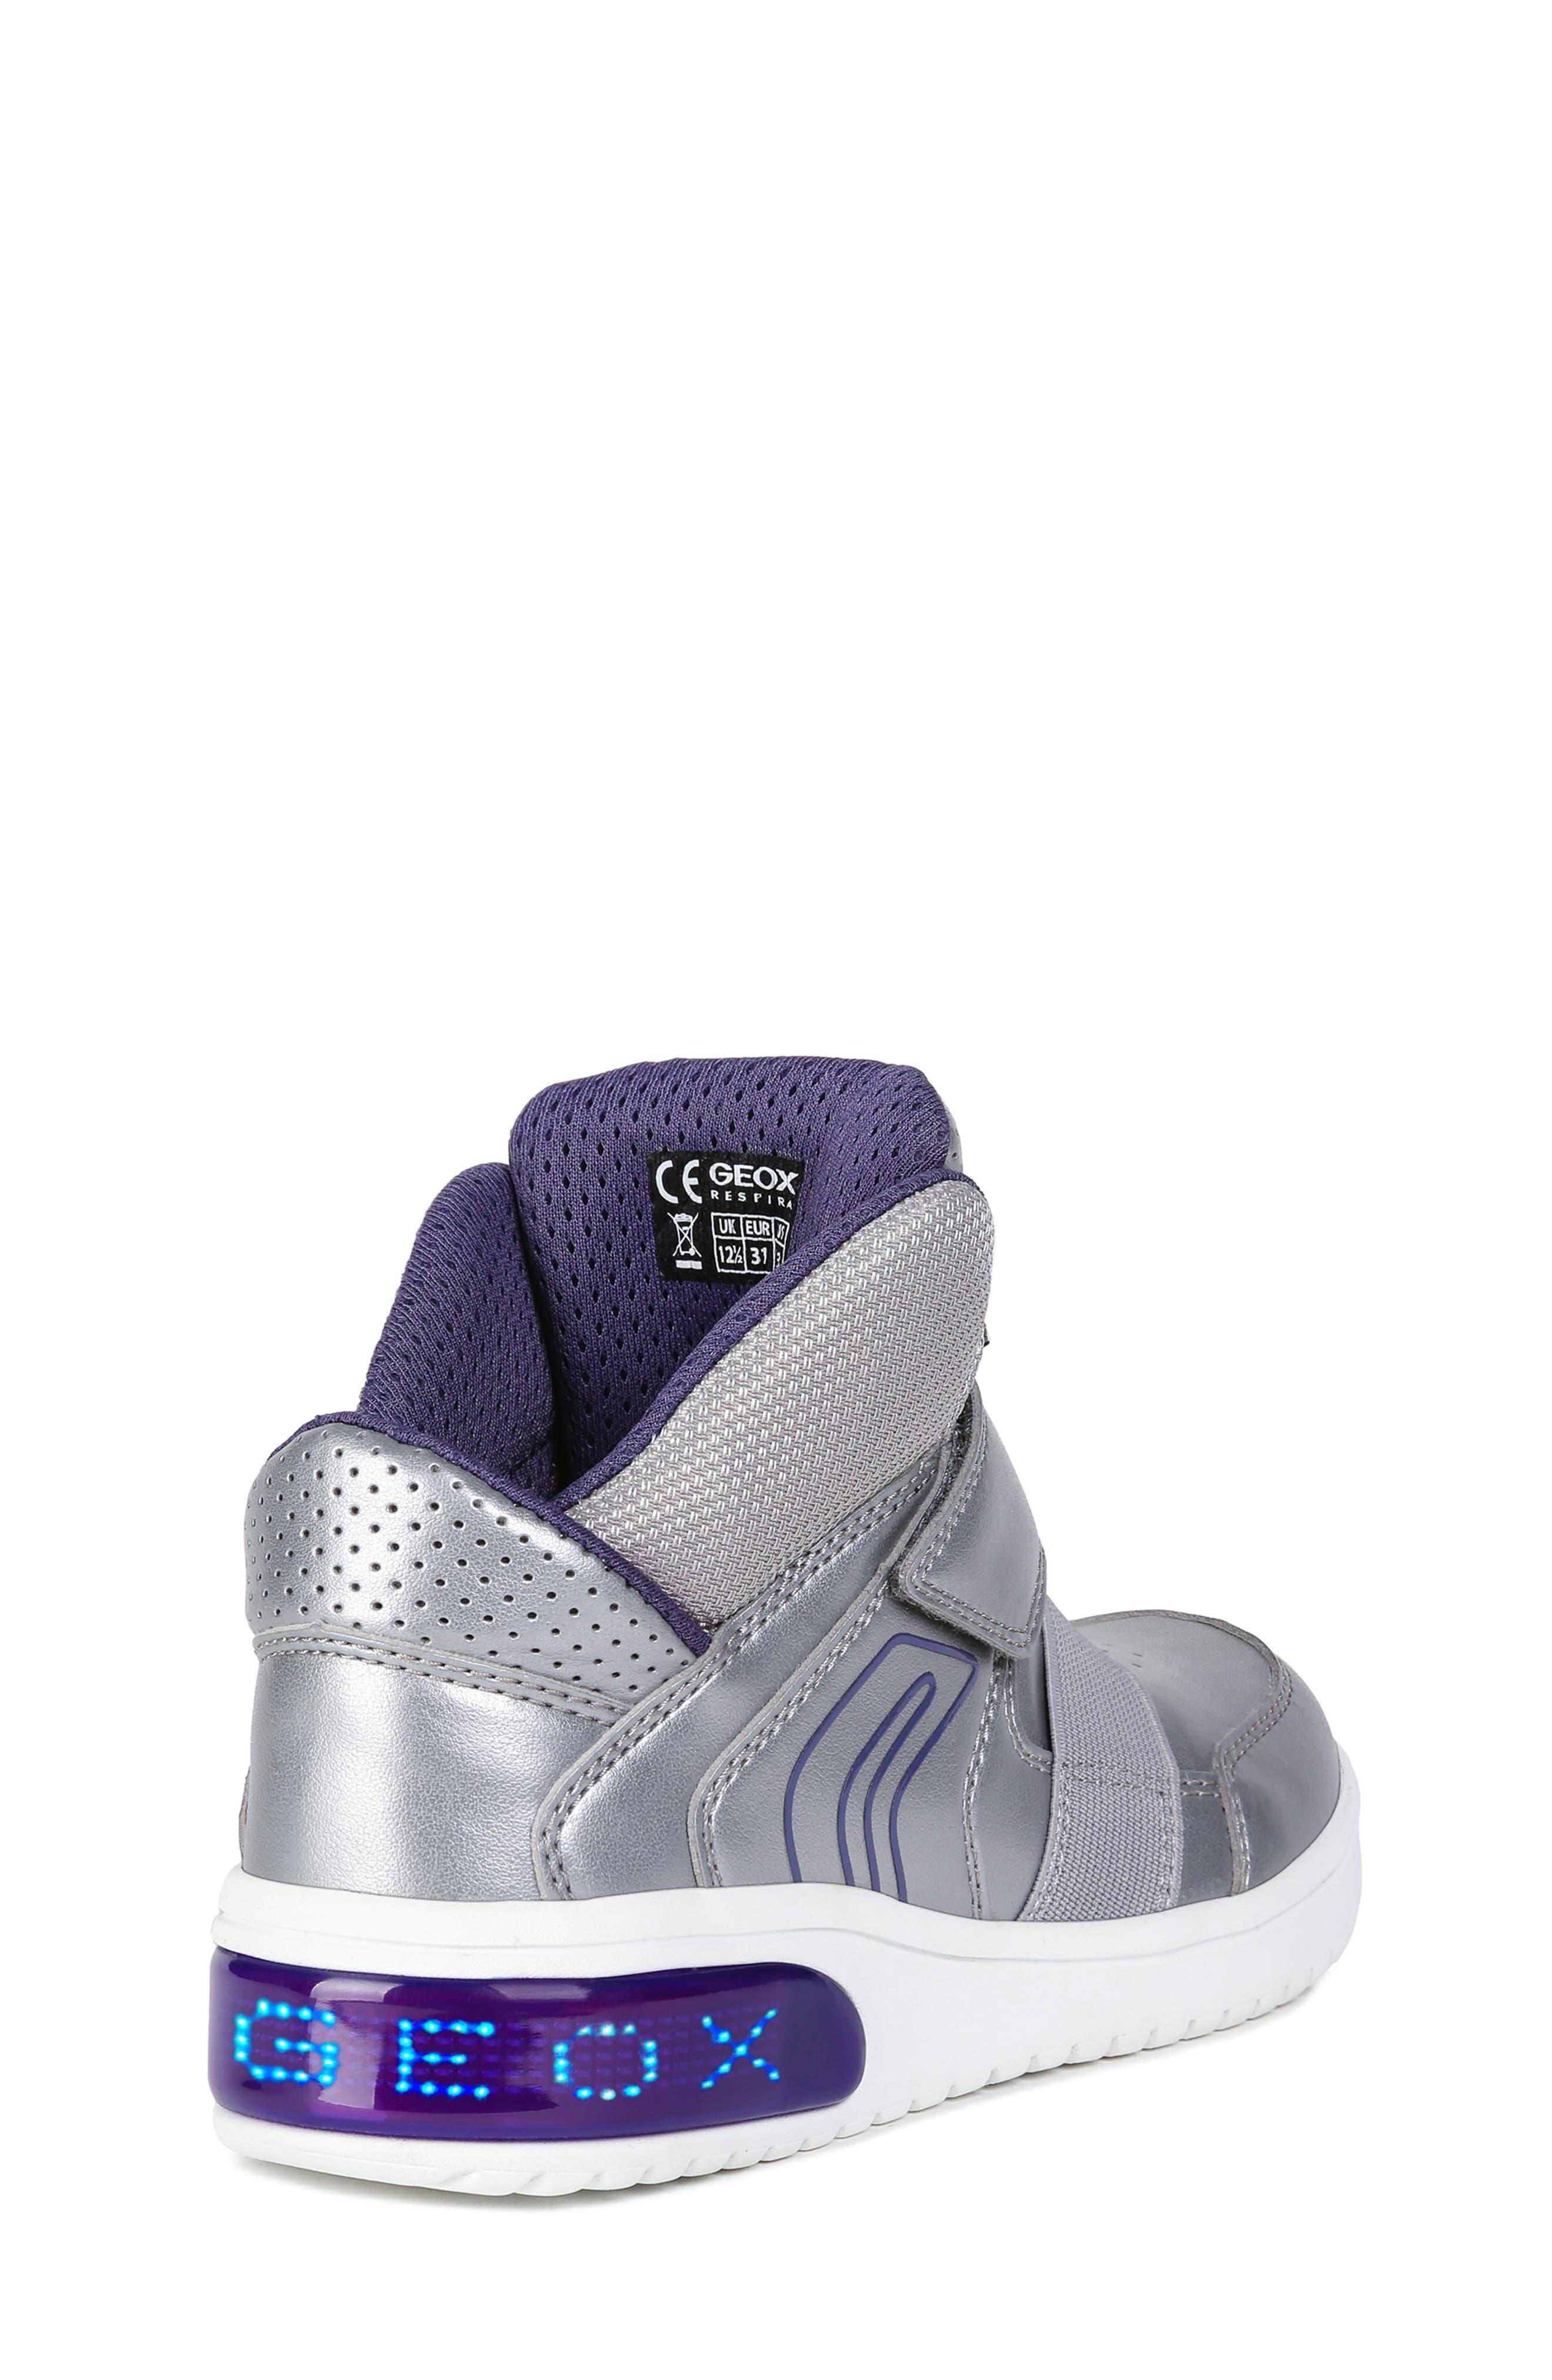 Xled Light Up Sneaker,                             Alternate thumbnail 7, color,                             SILVER/ VIOLET